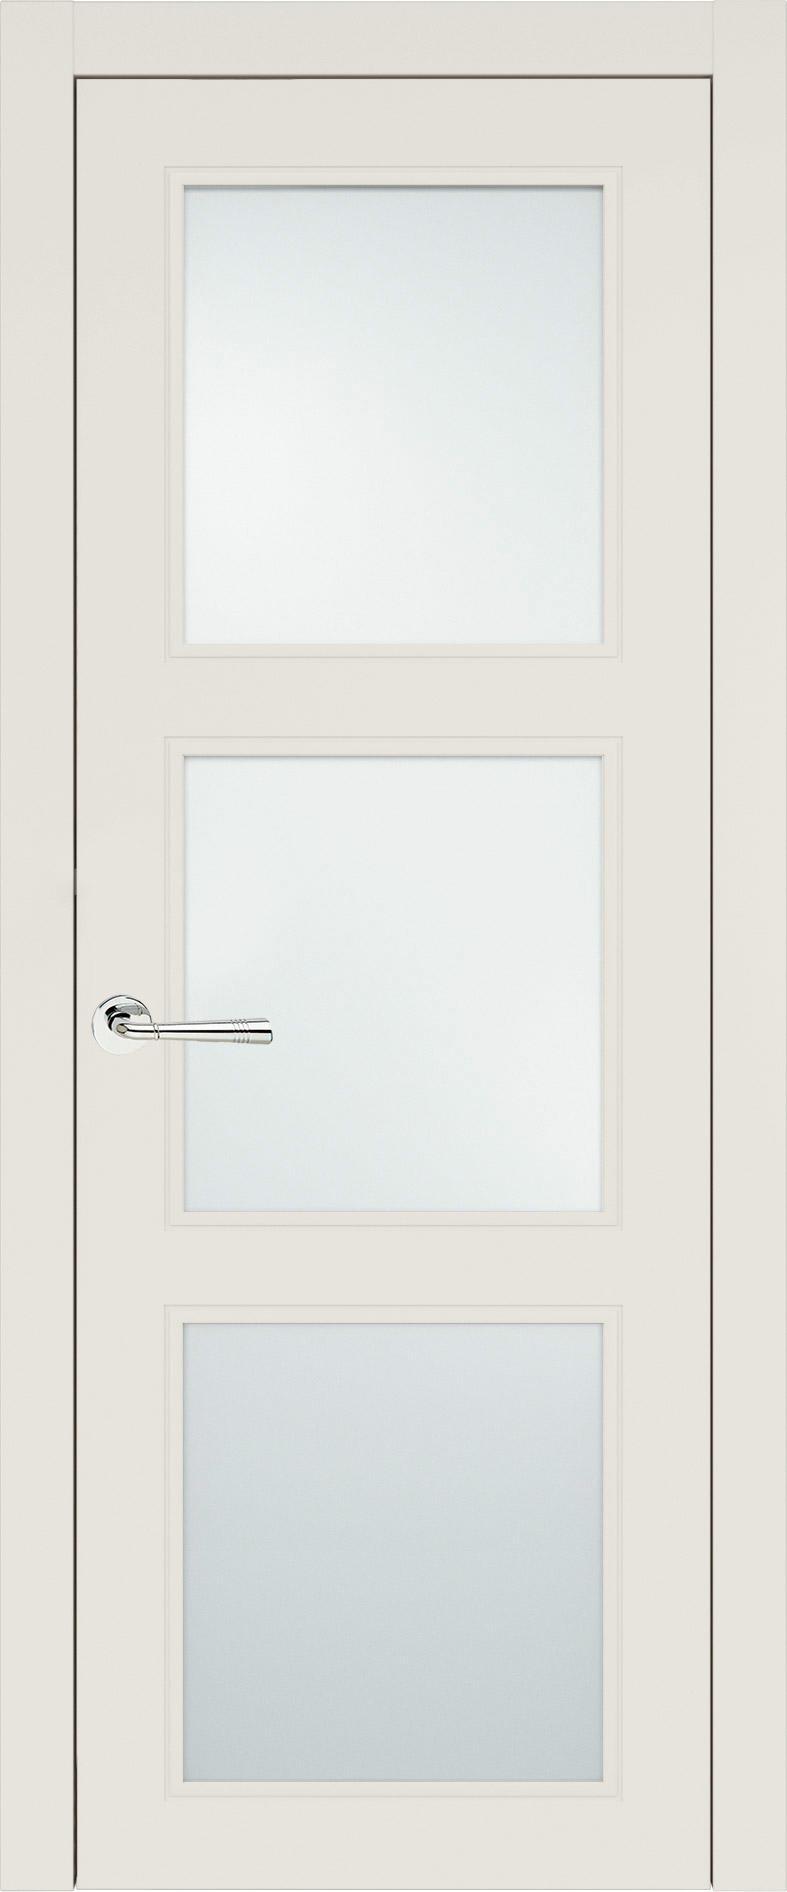 Milano Neo Classic цвет - Бежевая эмаль (RAL 9010) Со стеклом (ДО)